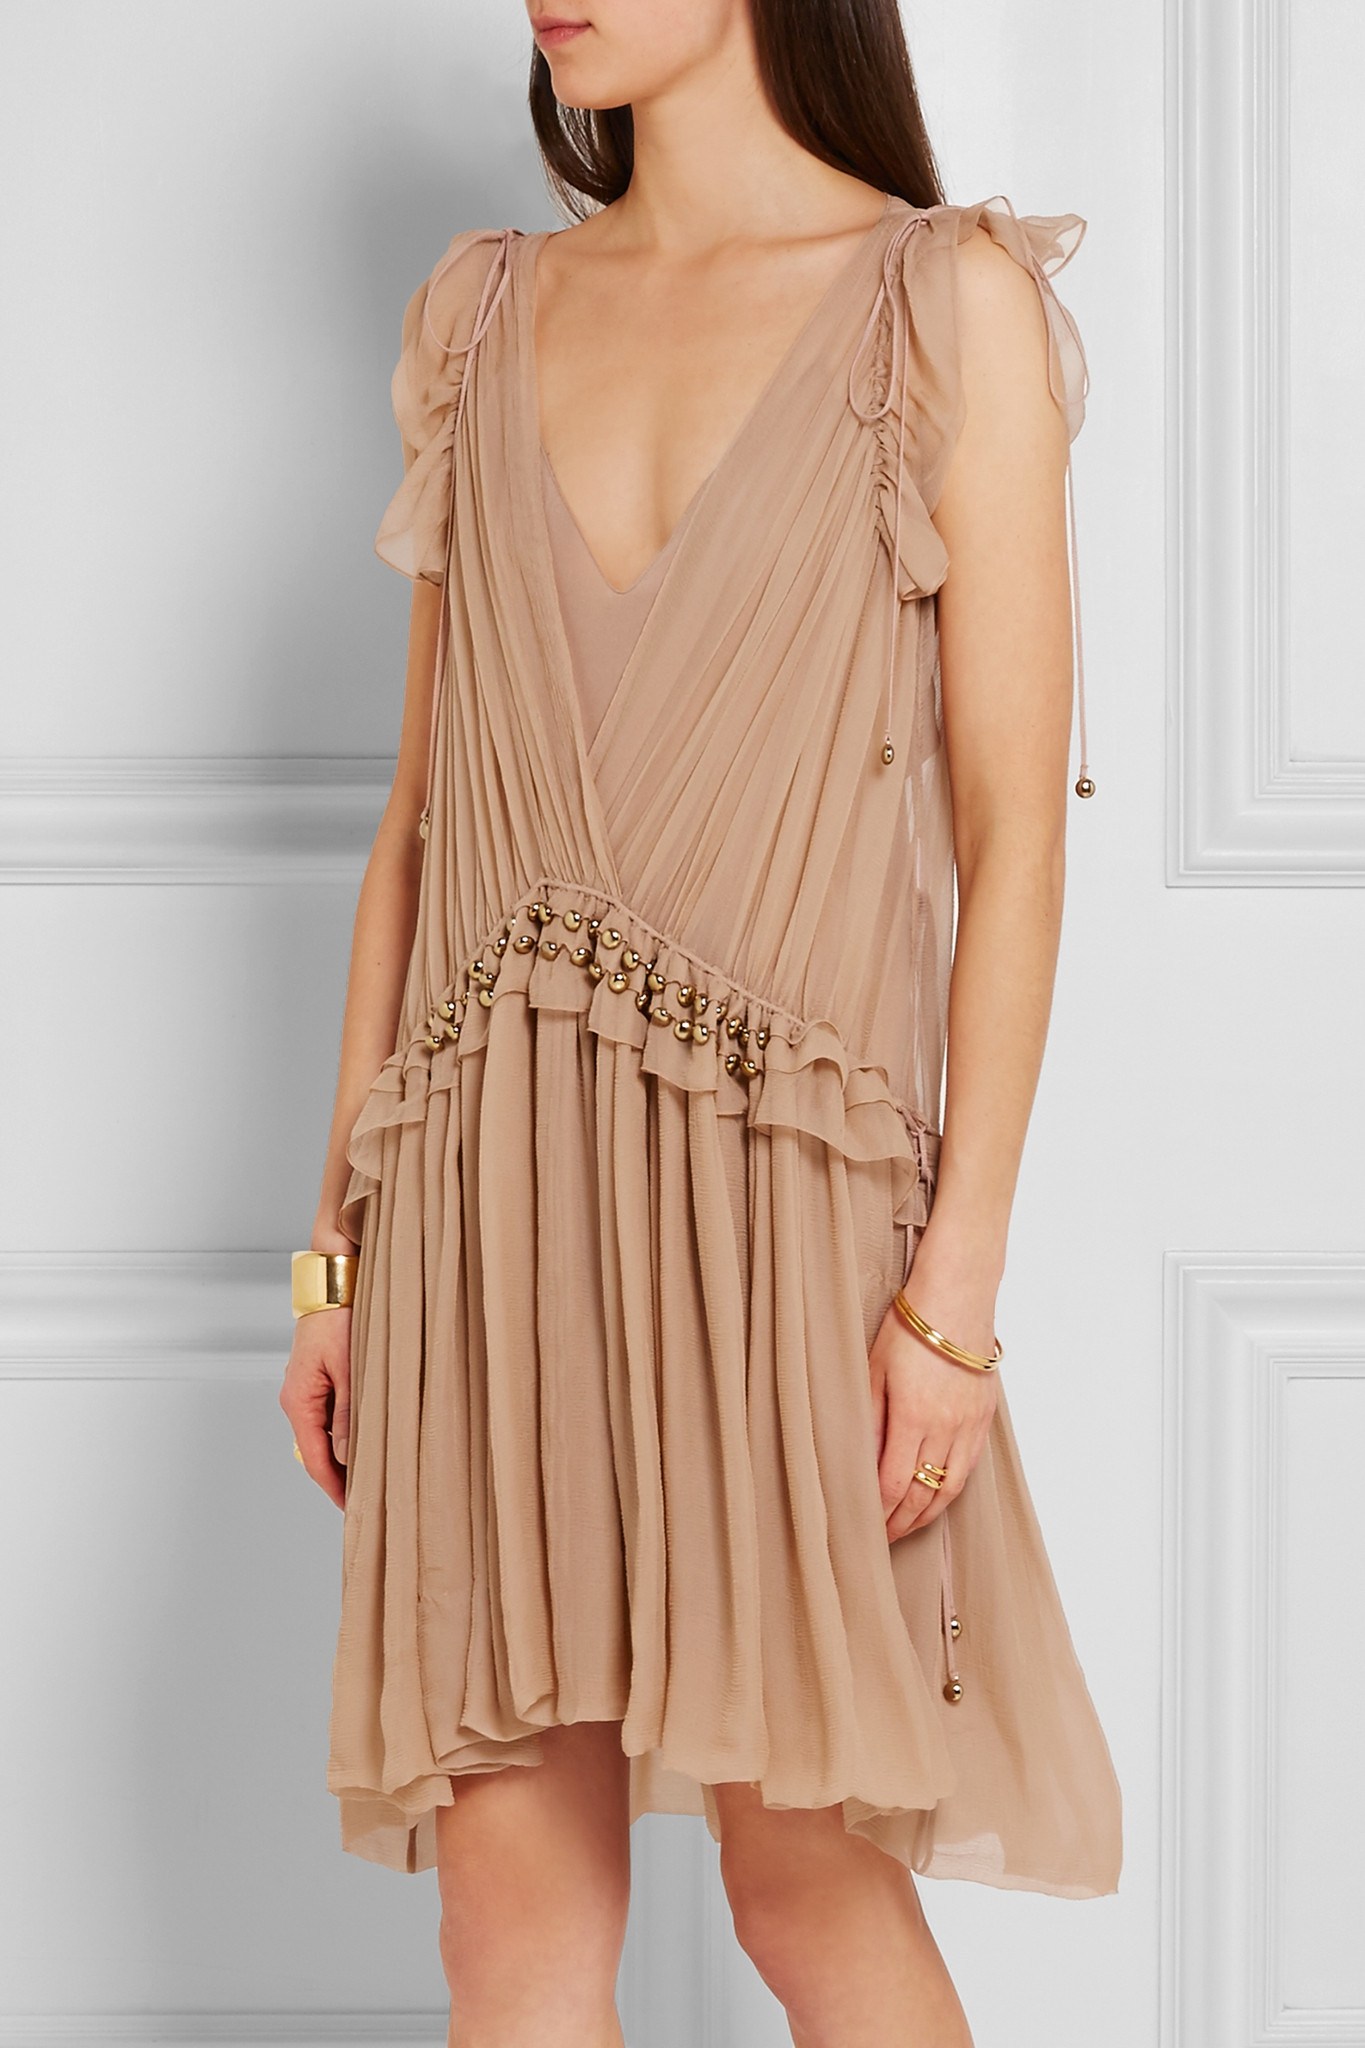 312262619c Lyst - Chloé Chloé - Ruffled Silk-chiffon Mini Dress - Blush in Blue